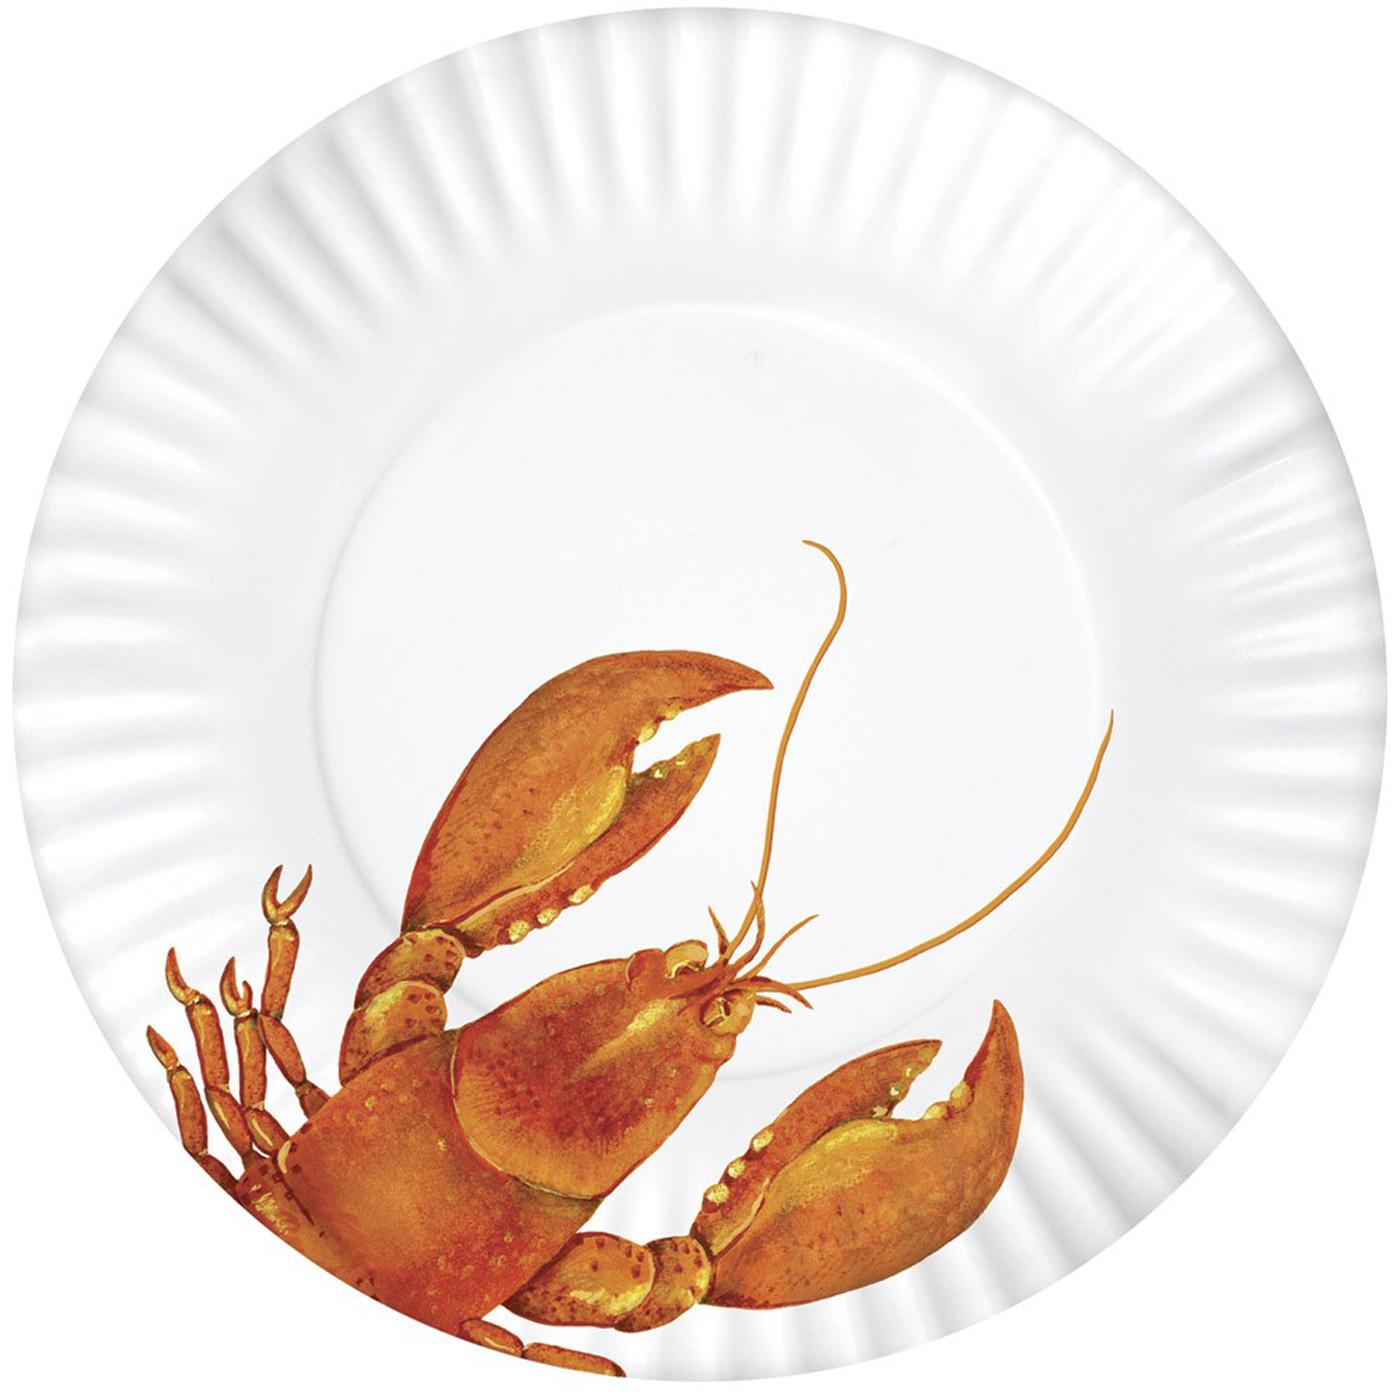 Melamine Plates 11 inch - Set of Four - Lobster